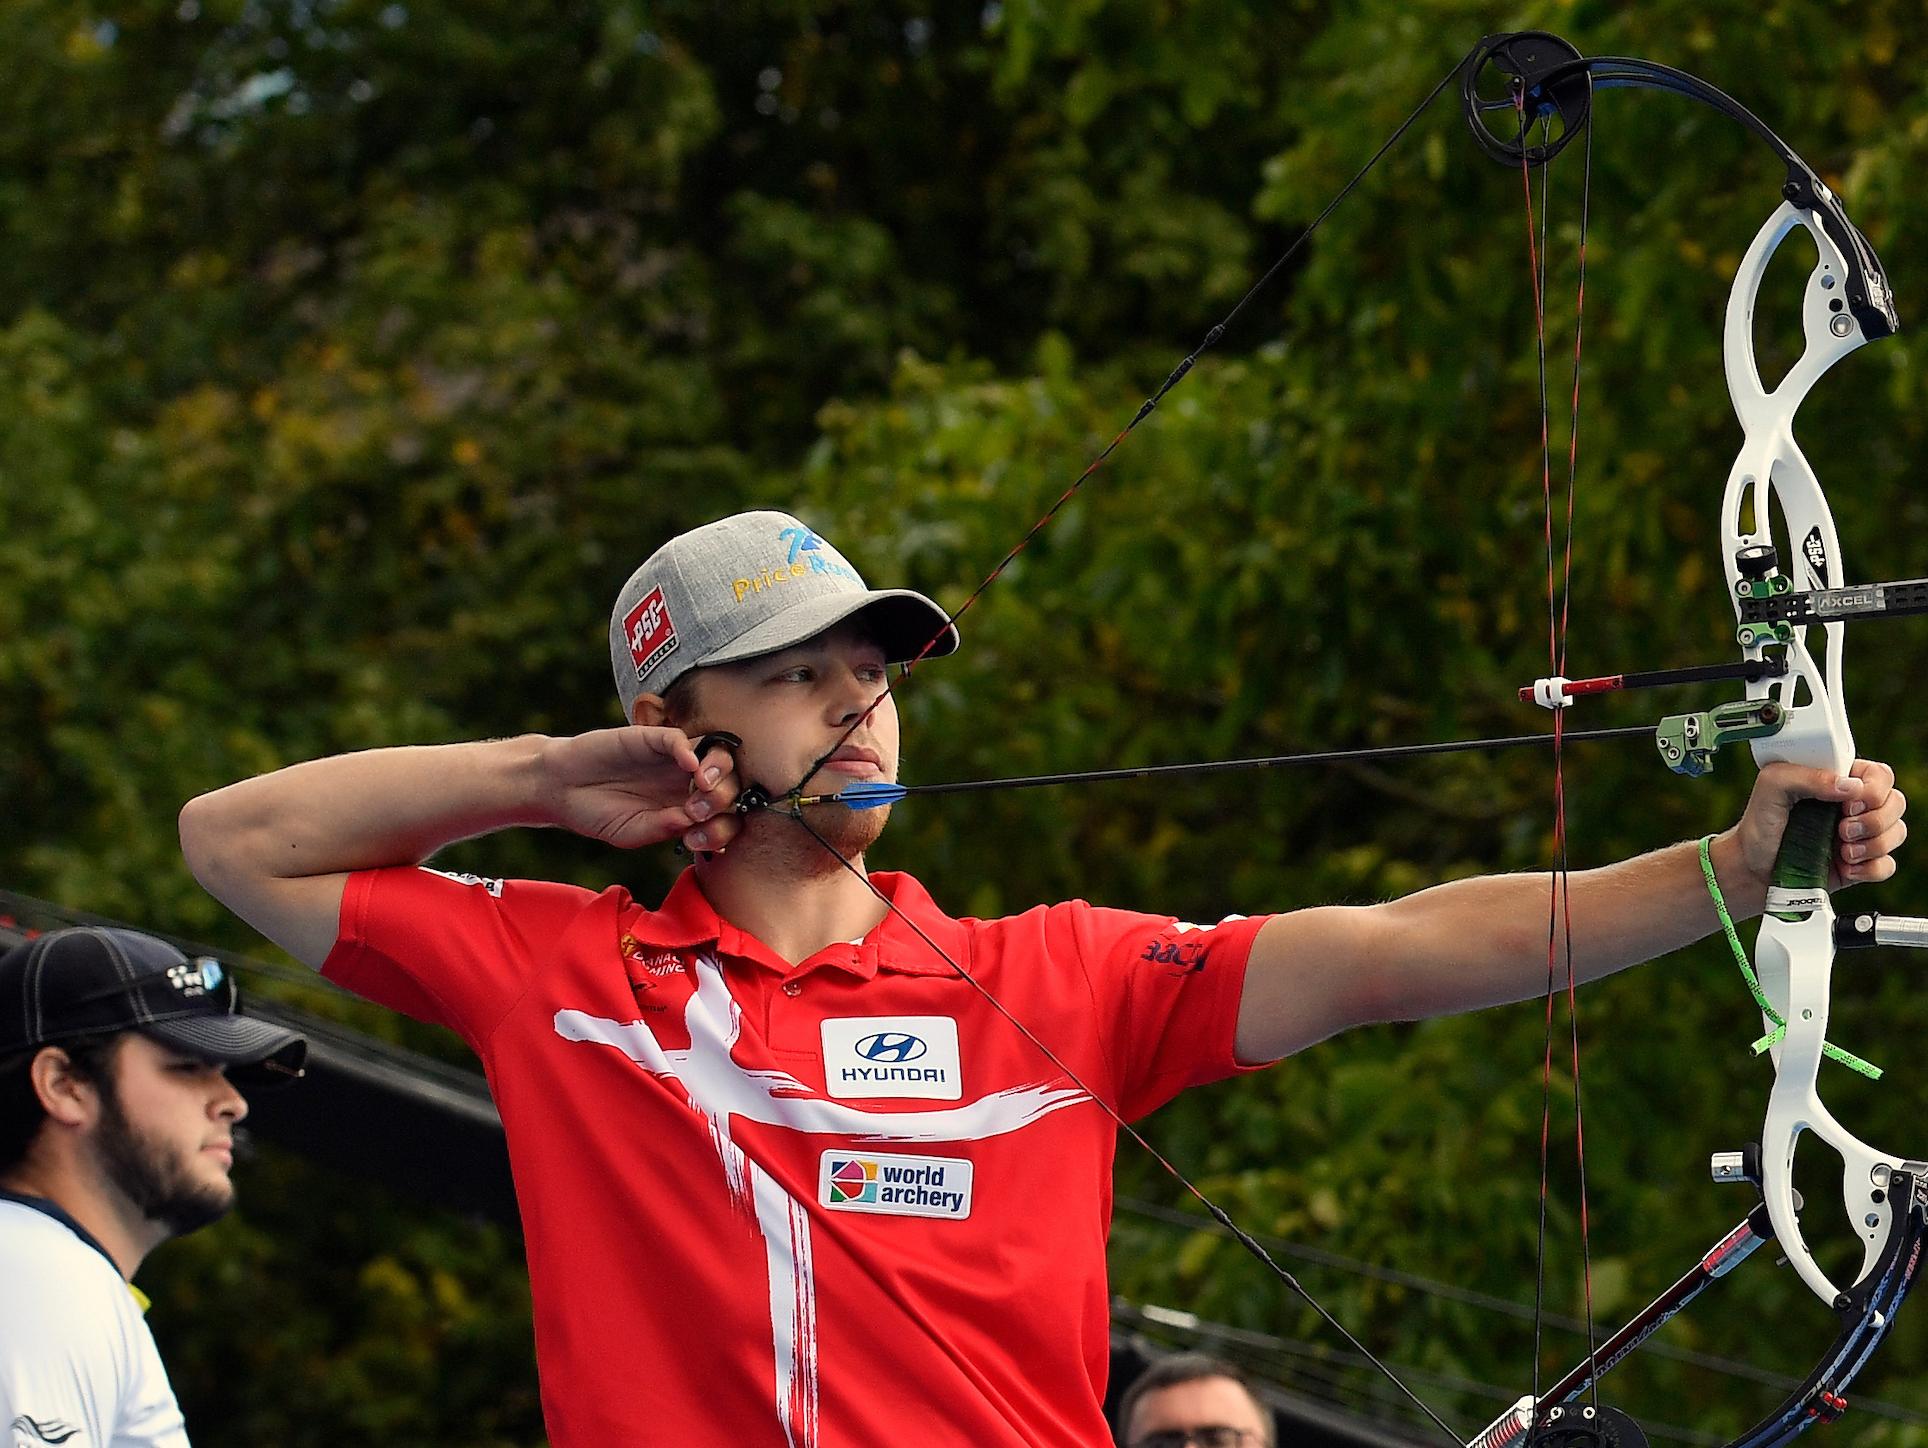 Hyundai Archery World Cup Final 2016